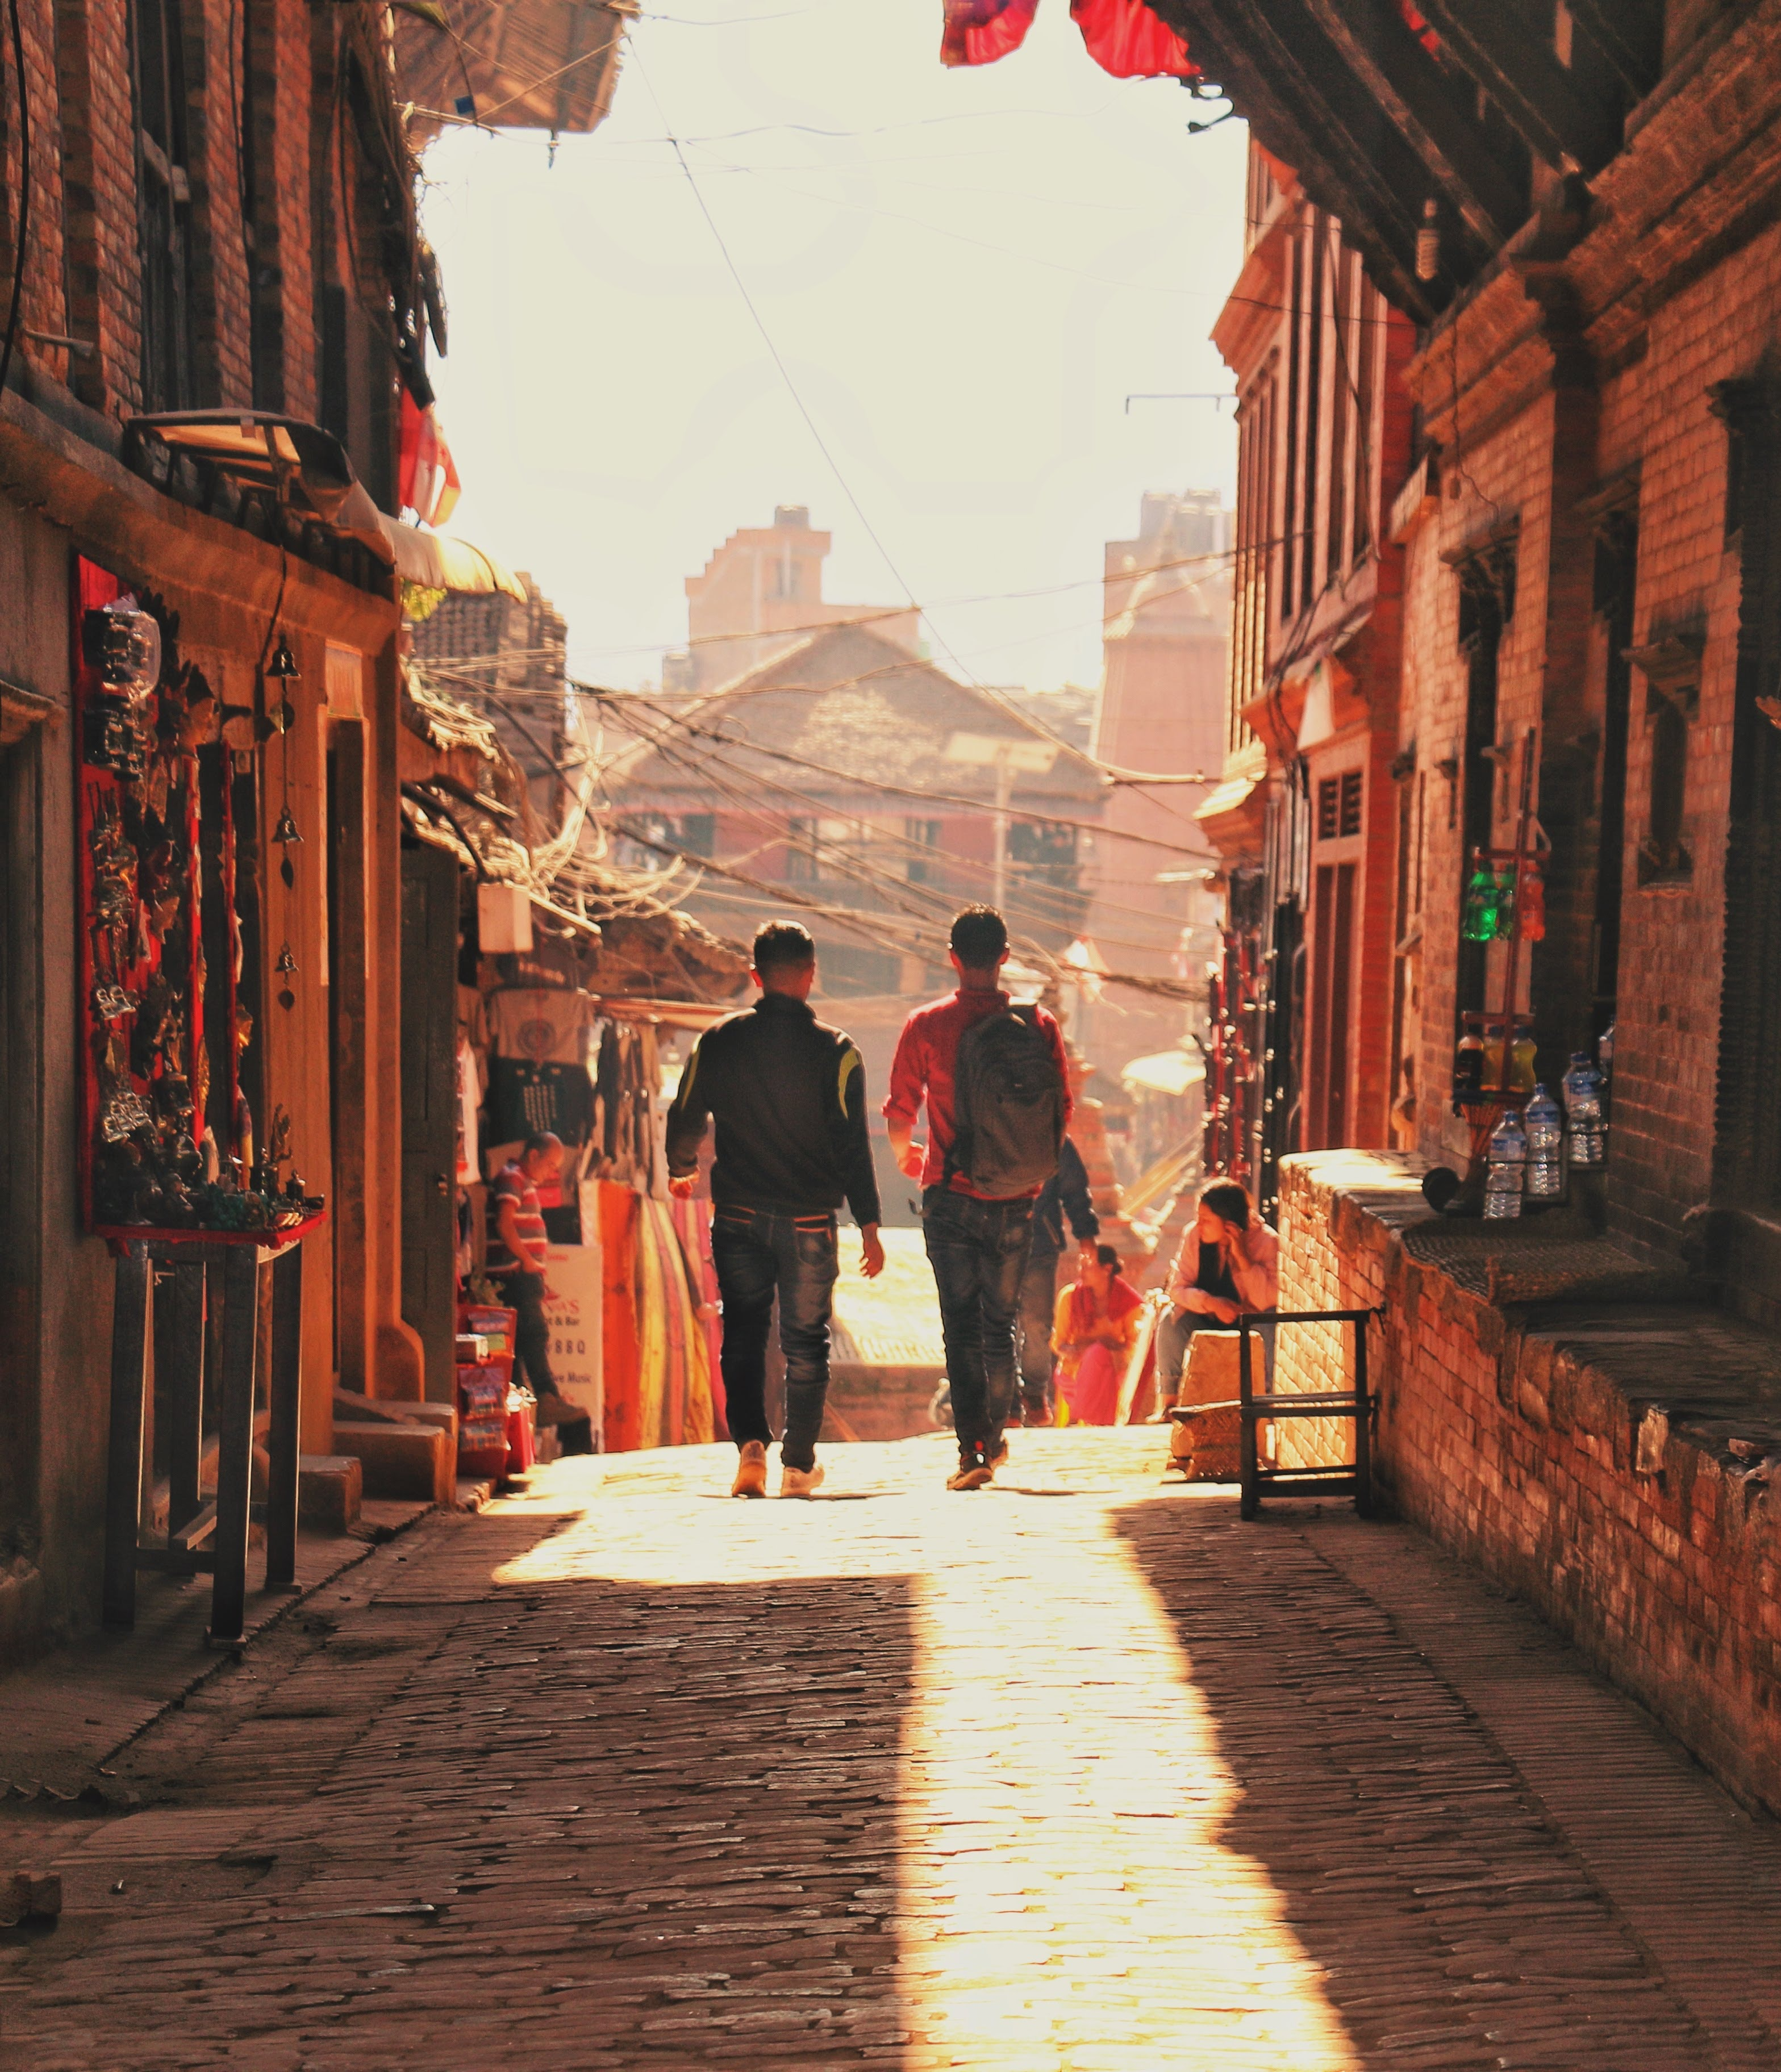 Two Man Walking Beside Brick Houses, People, Walking, Urban, Town, HQ Photo